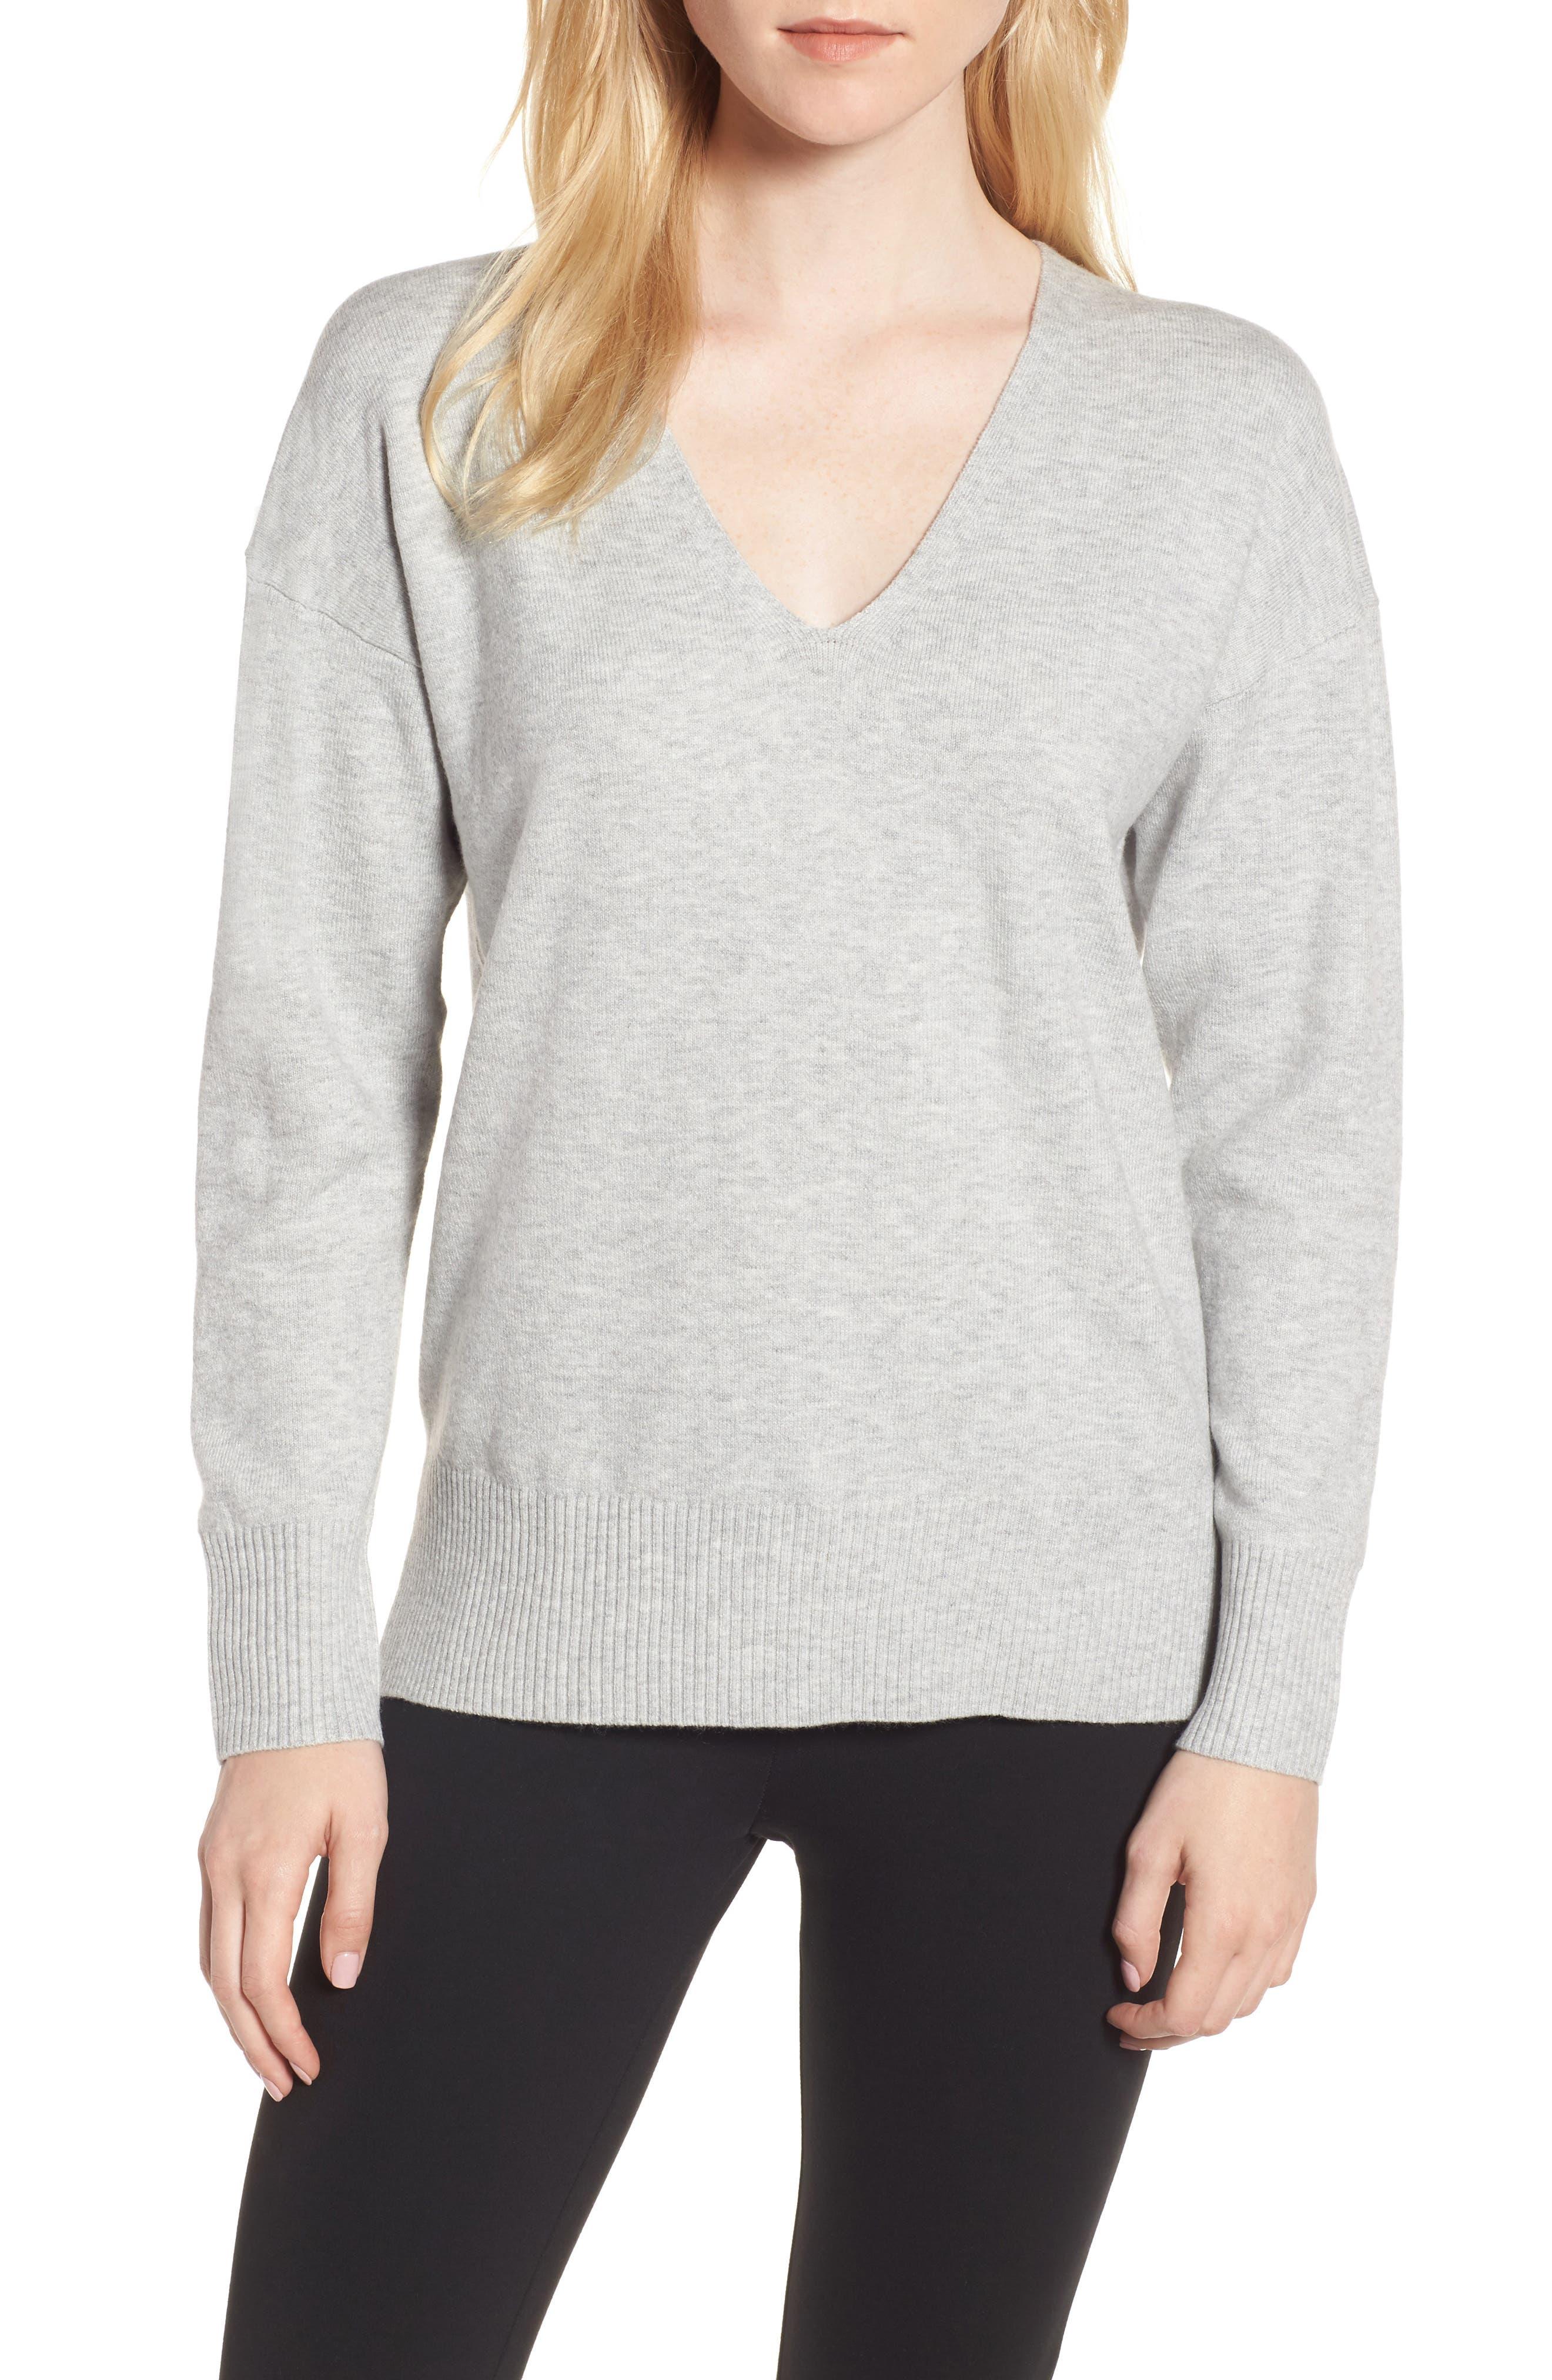 Della Vhari V-Neck Sweater,                             Main thumbnail 1, color,                             050